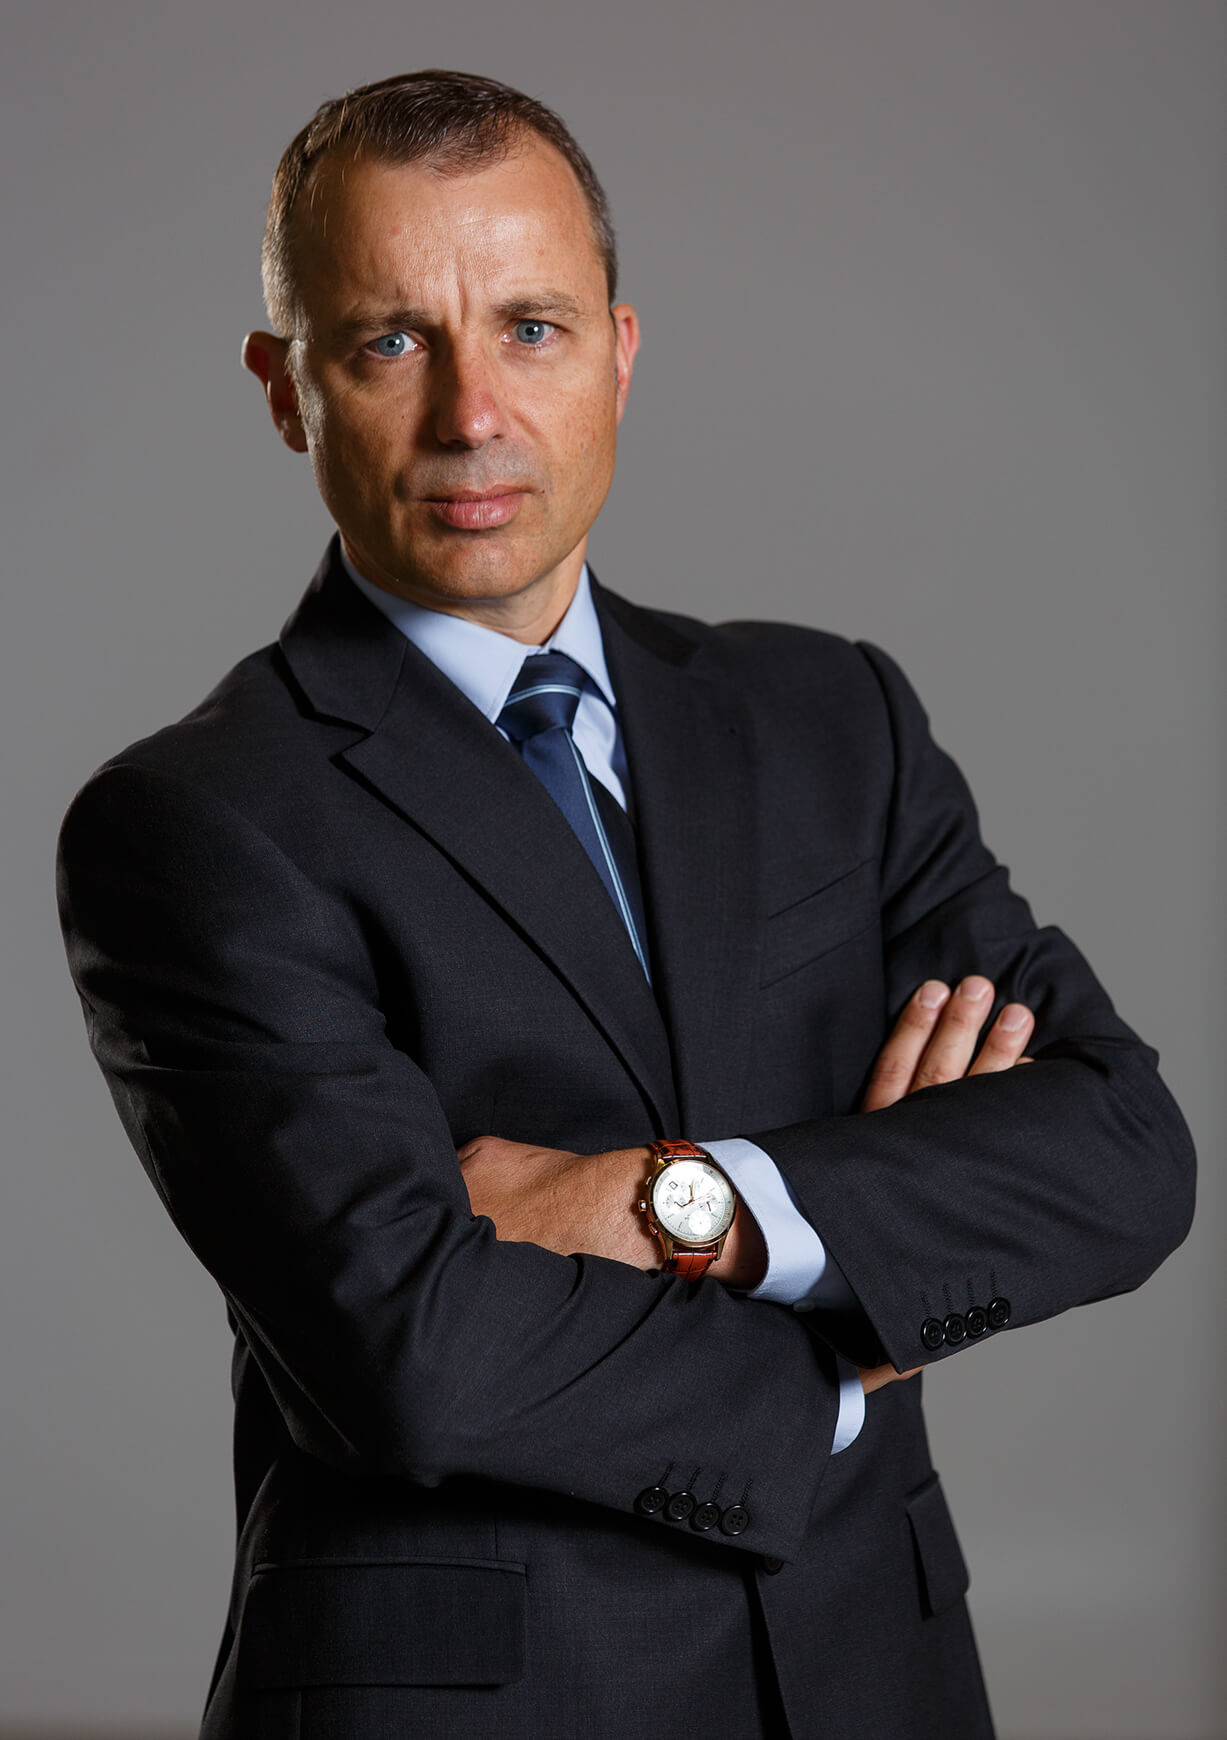 GQ style male corporate portrait